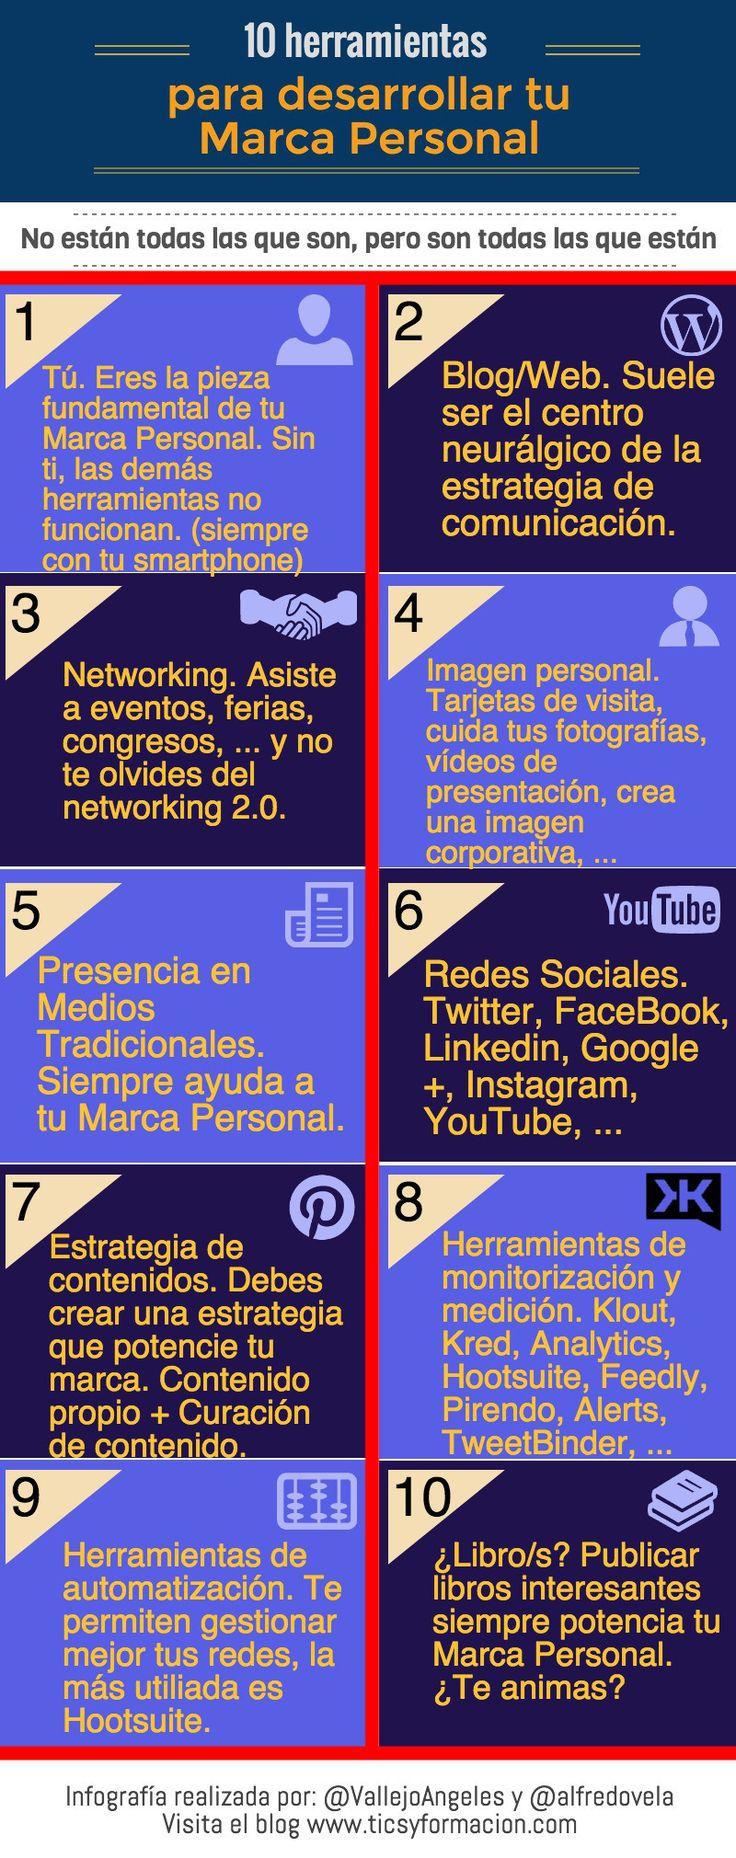 10 herramientas para desarrollar tu Marca Personal #infografia #infographic #marketing